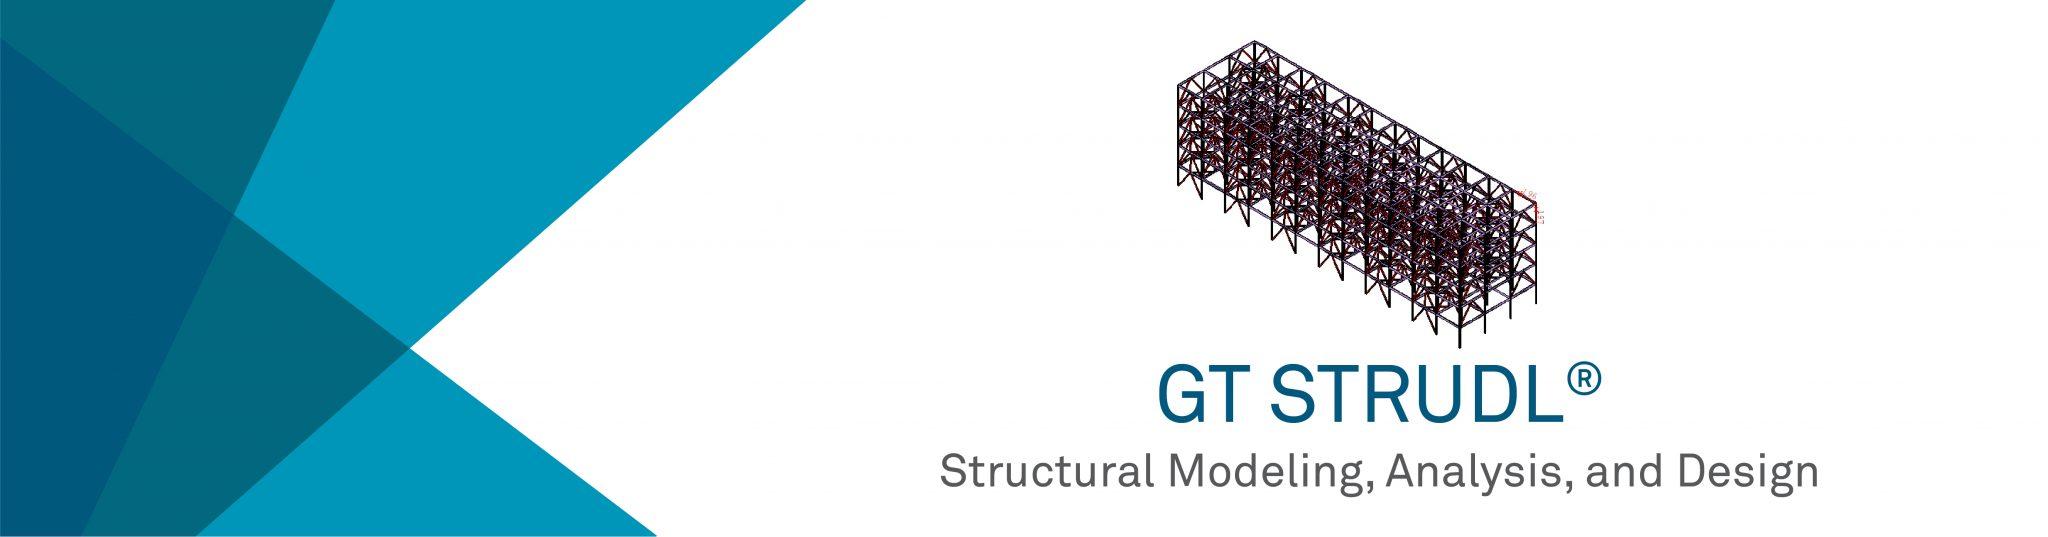 Structural Analysis & Design